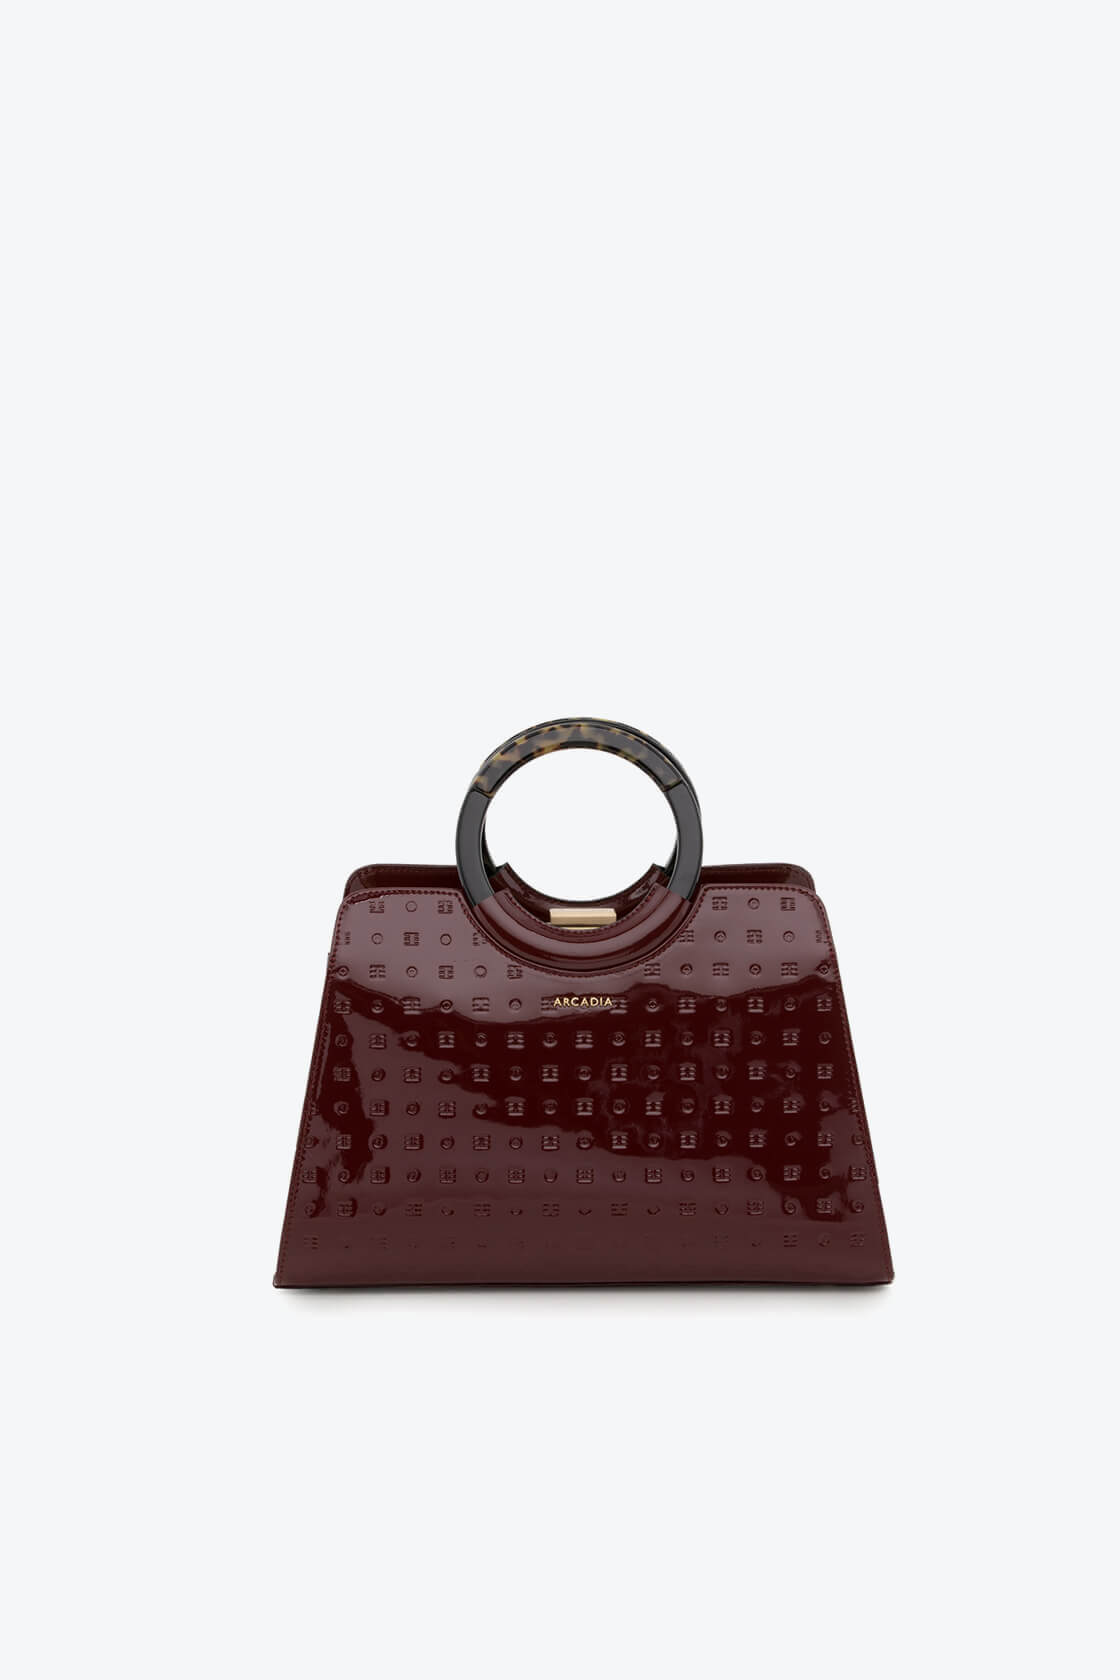 ol80000109 area large top handles bag 1